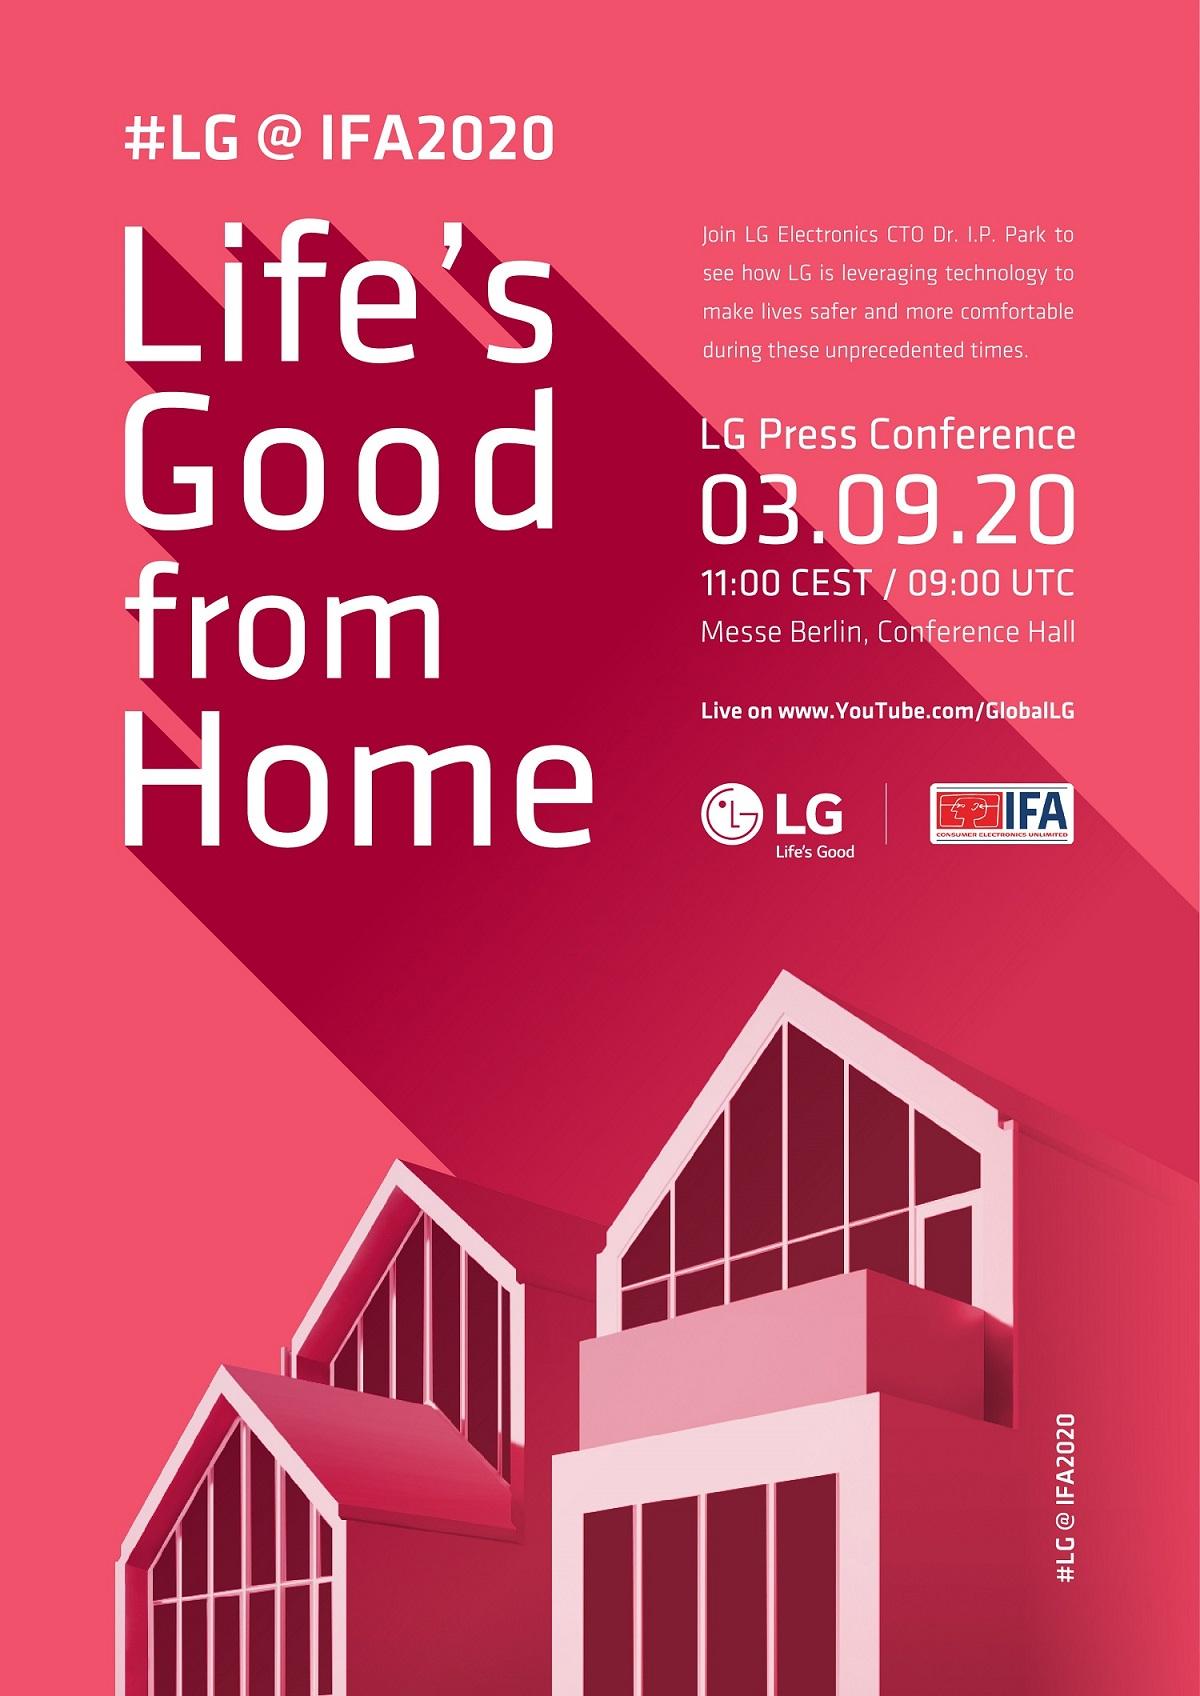 LG Invites Consumers Around the World to IFA 2020 Online